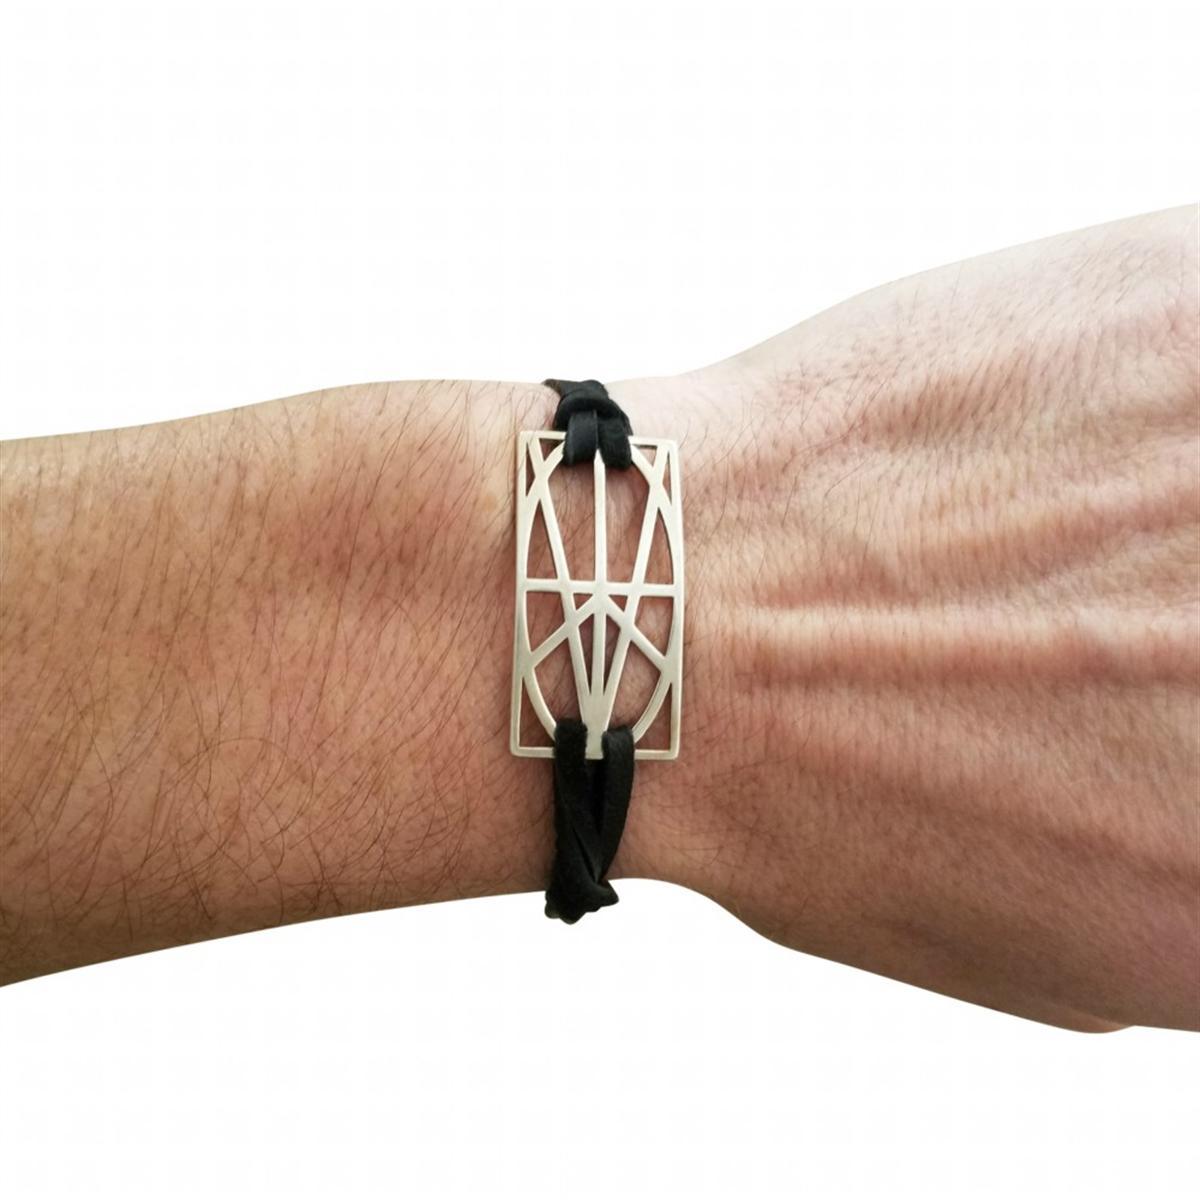 Picture of Men's Sterling Silver Wrap & Tuck Bracelet - Black